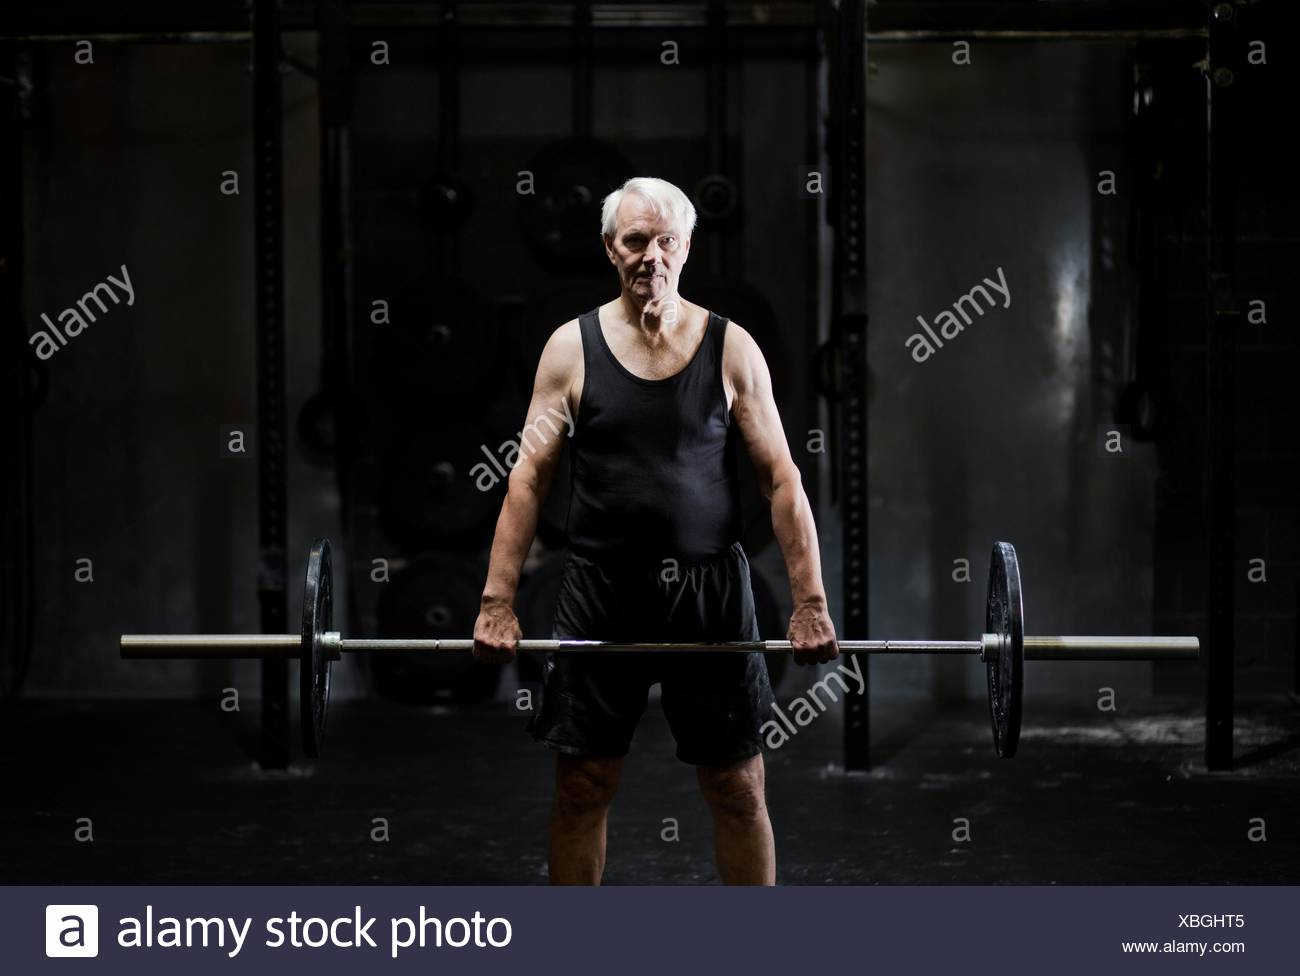 Senior man weightlifting barbell in dark gym - Stock Image